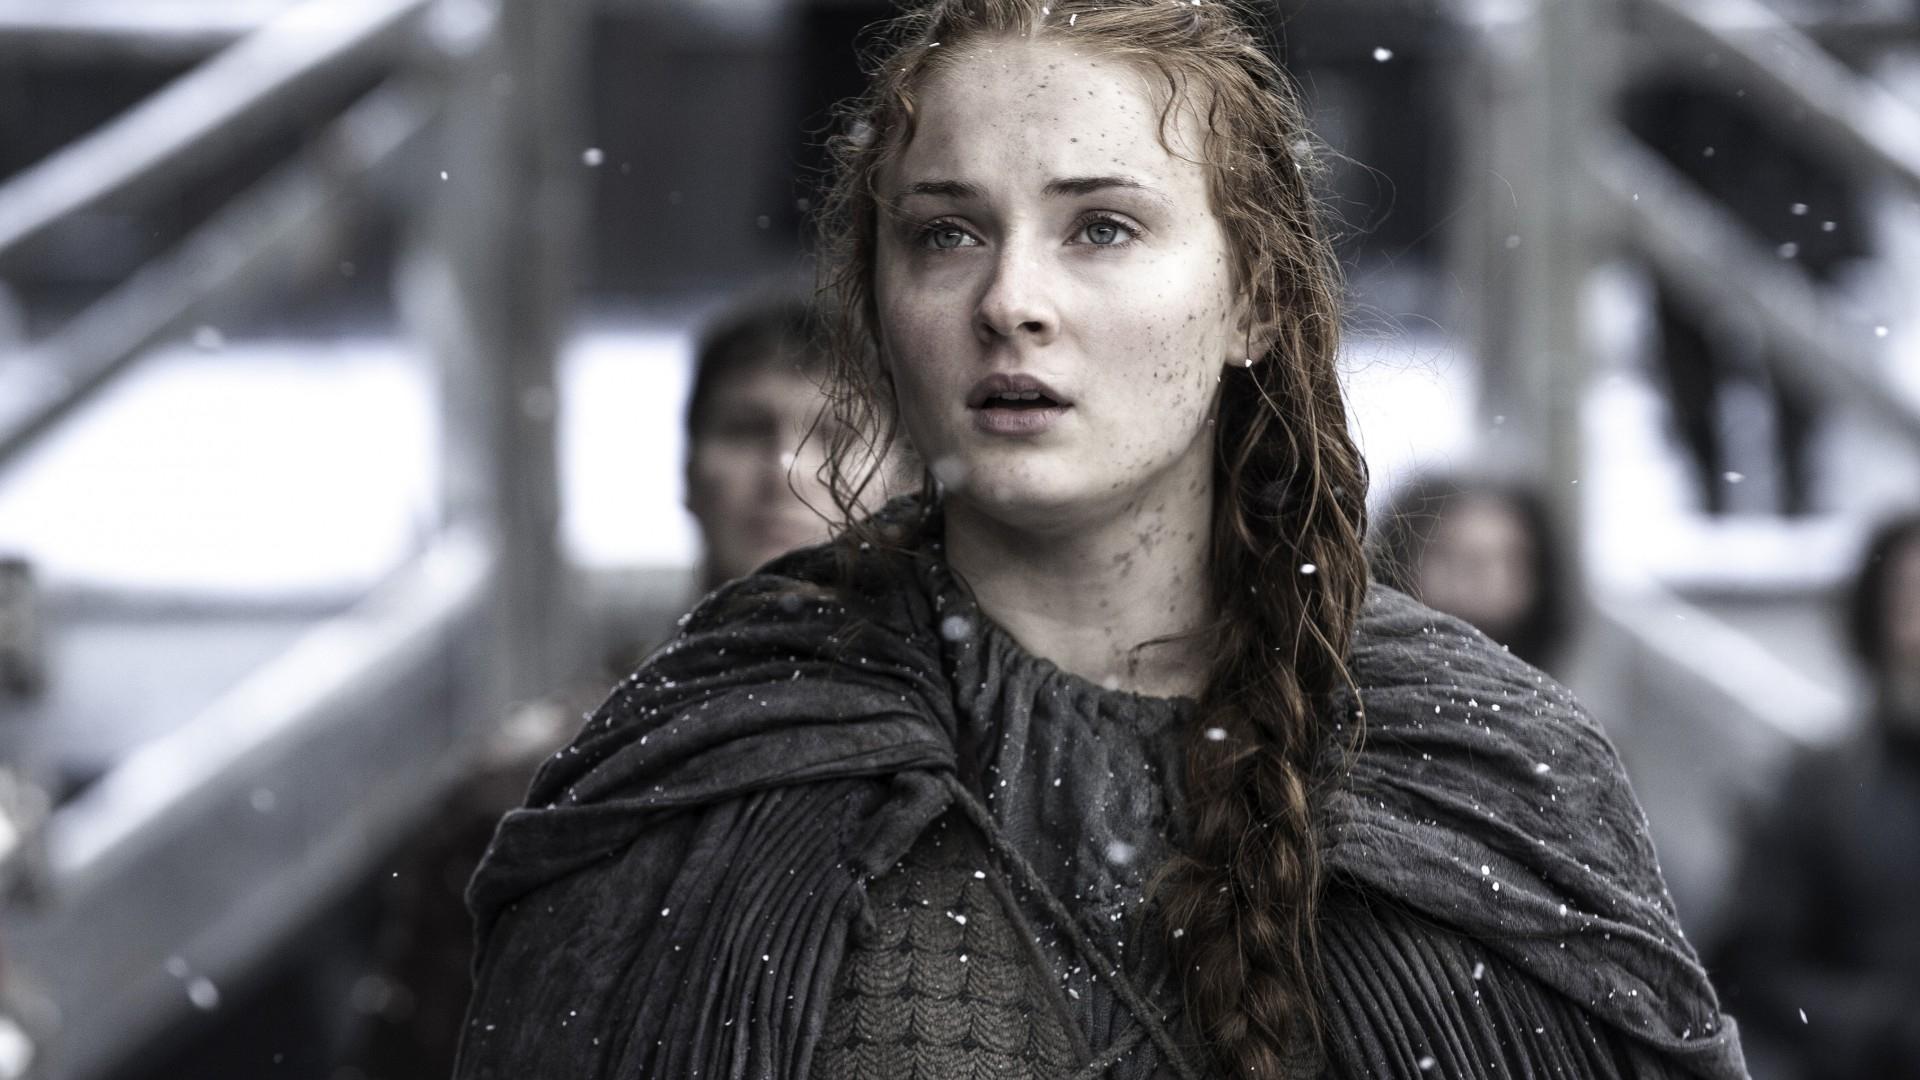 People 1920x1080 Game of Thrones Sansa Stark Sophie Turner women